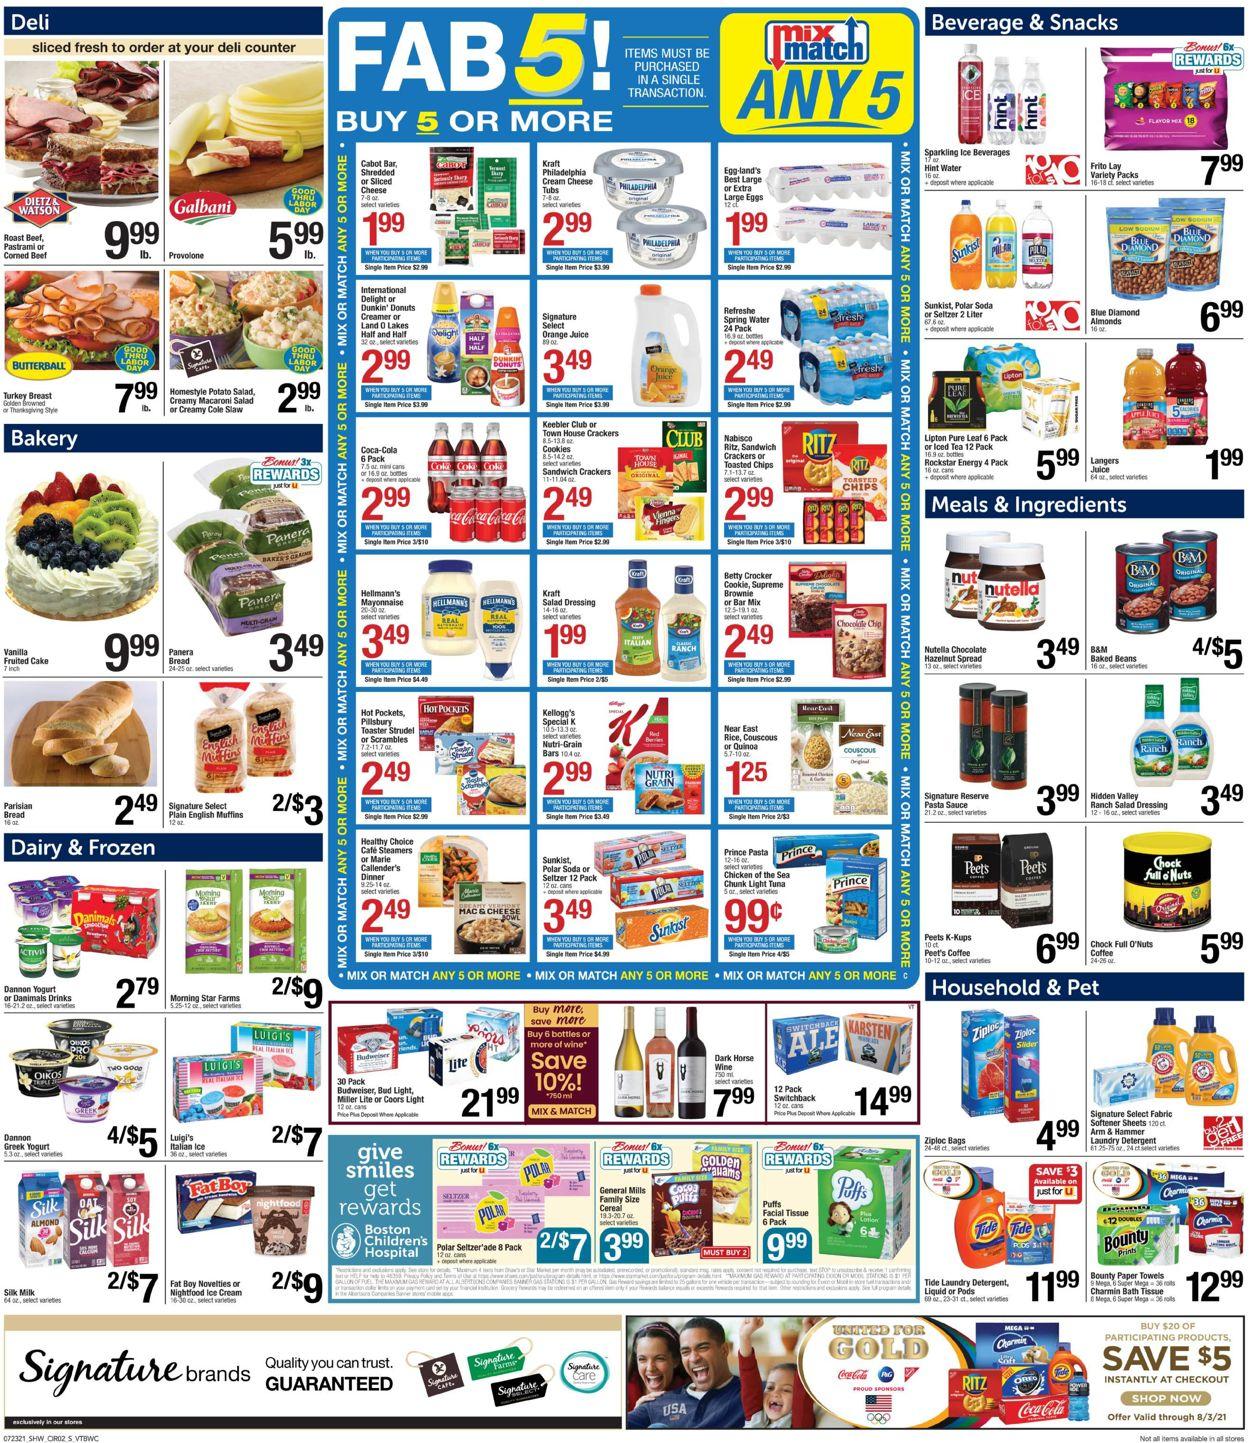 Shaw's Weekly Ad Circular - valid 07/23-07/29/2021 (Page 3)